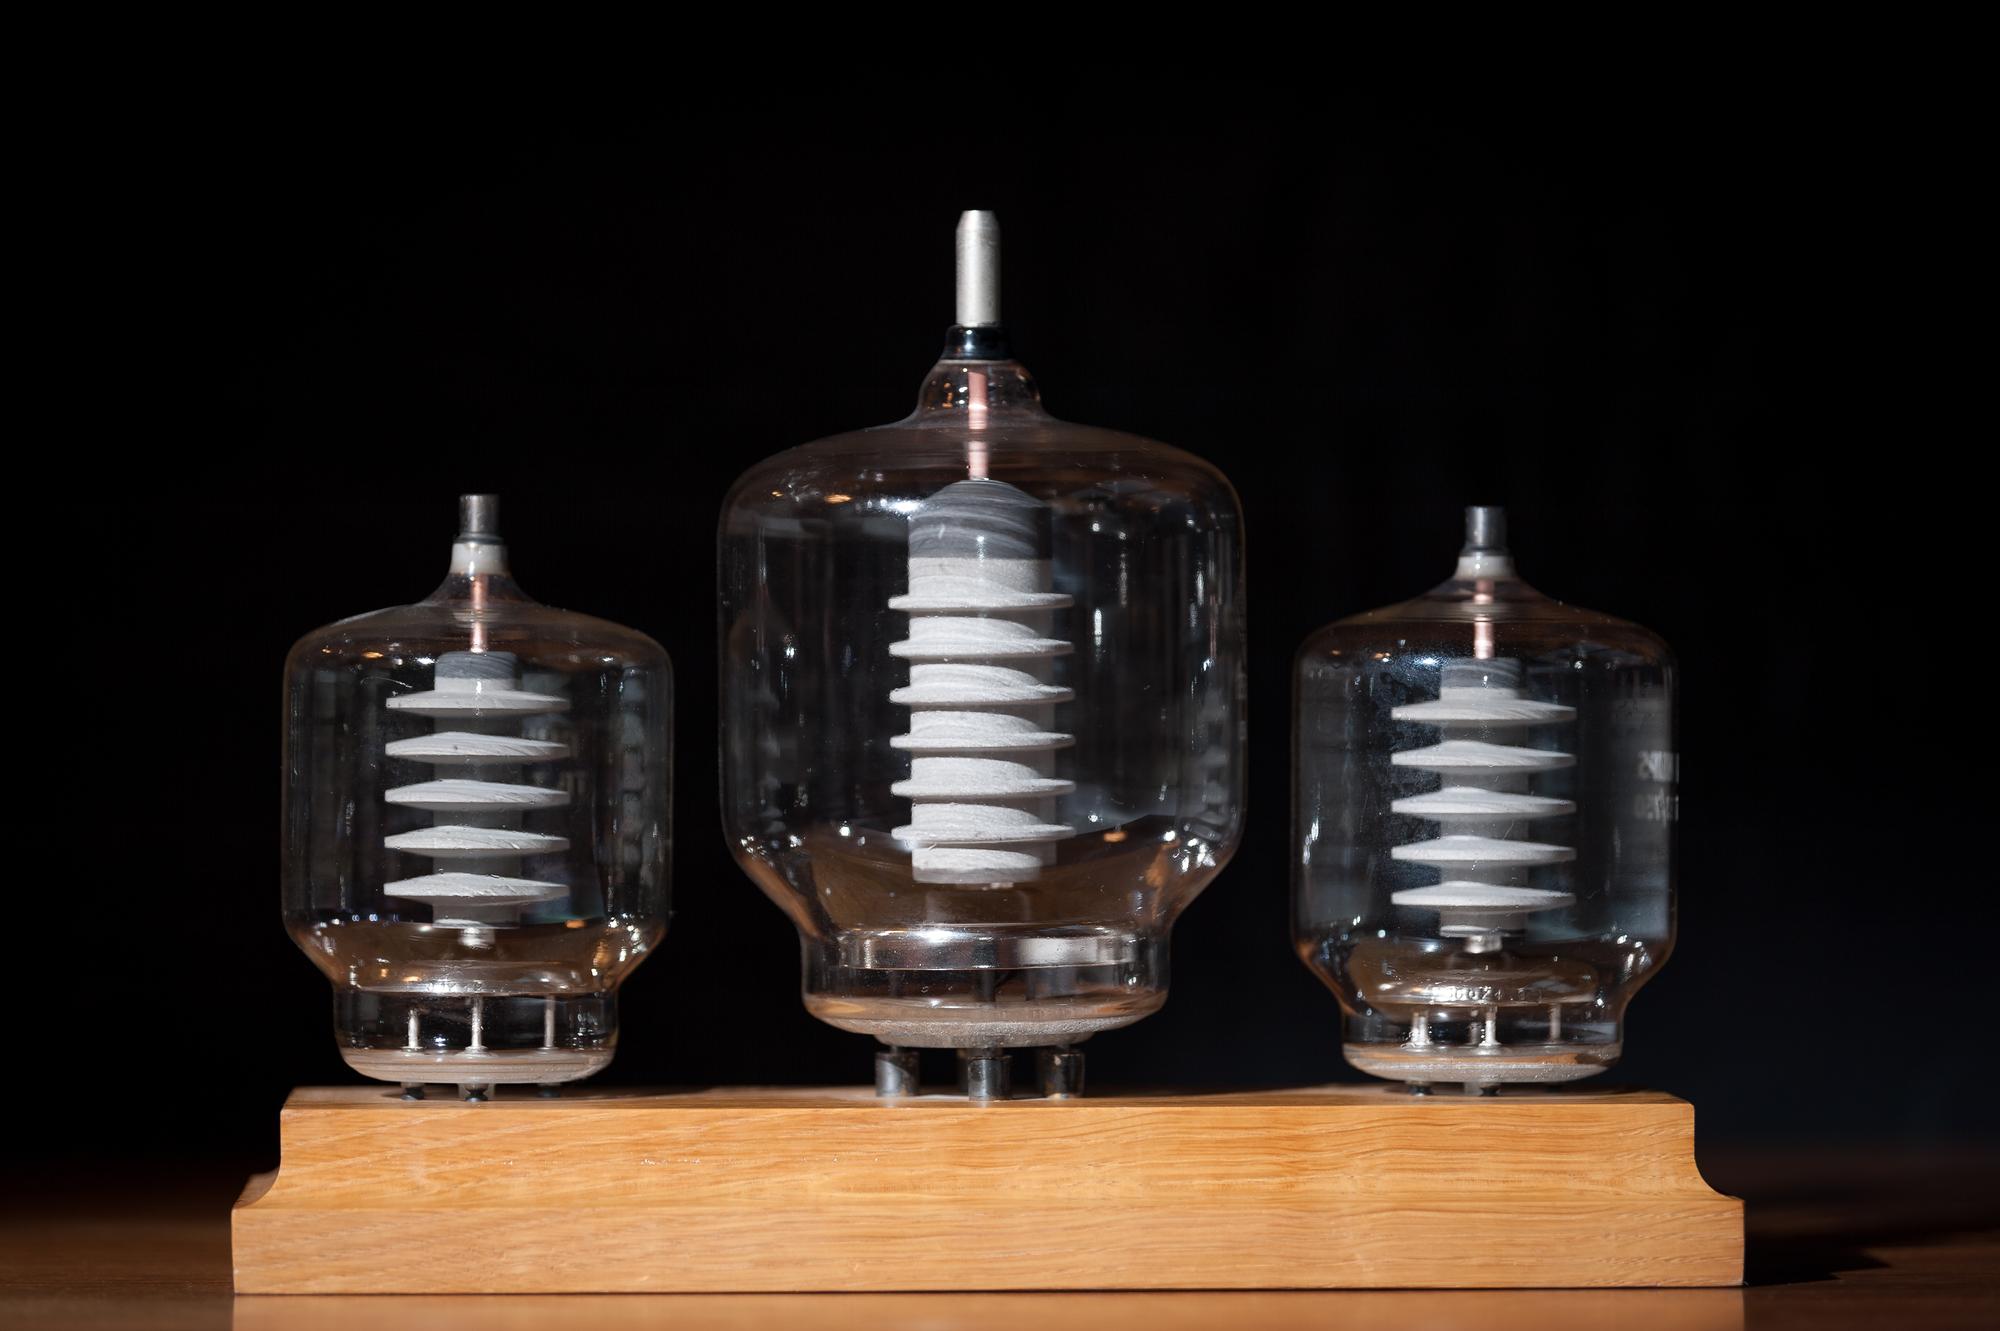 Douk Audio Mini 6J1 Vacuum Tube Pre-Amplifier Reviewed